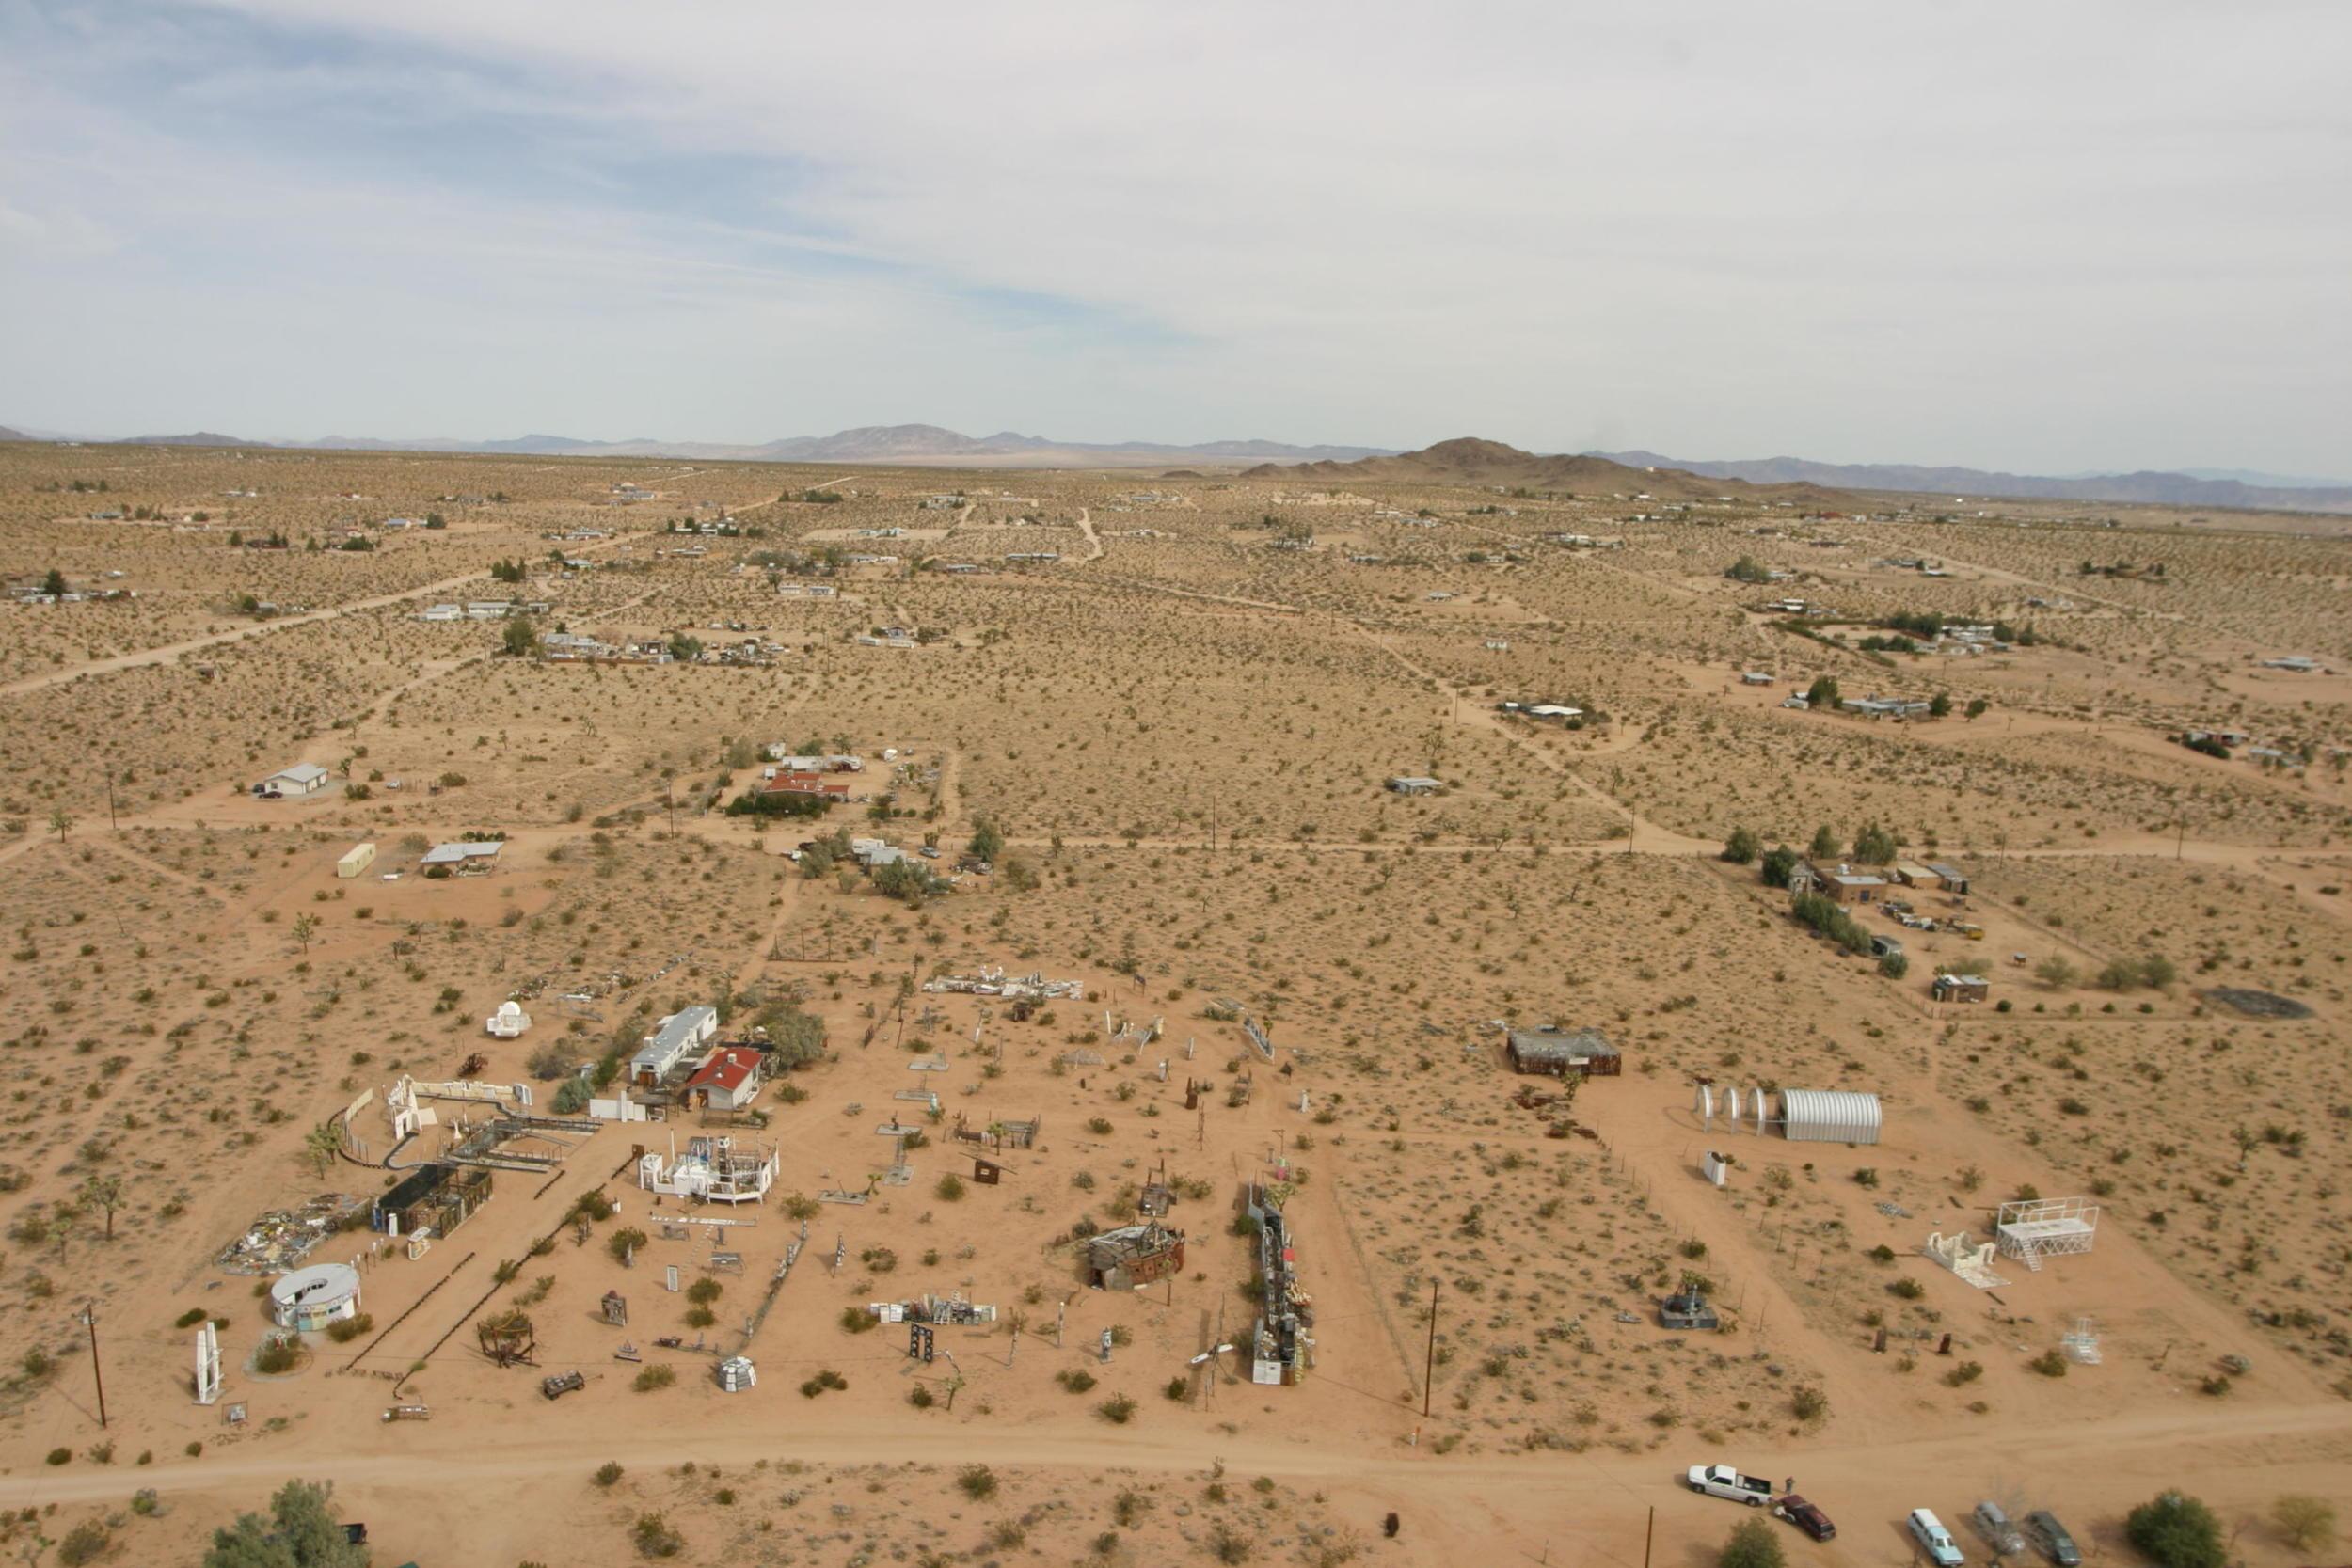 Foreground: Outdoor Desert Art Museum of Assemblage Sculpture | Photo: Low Altitude Blimp Photography | www.lablimp.com